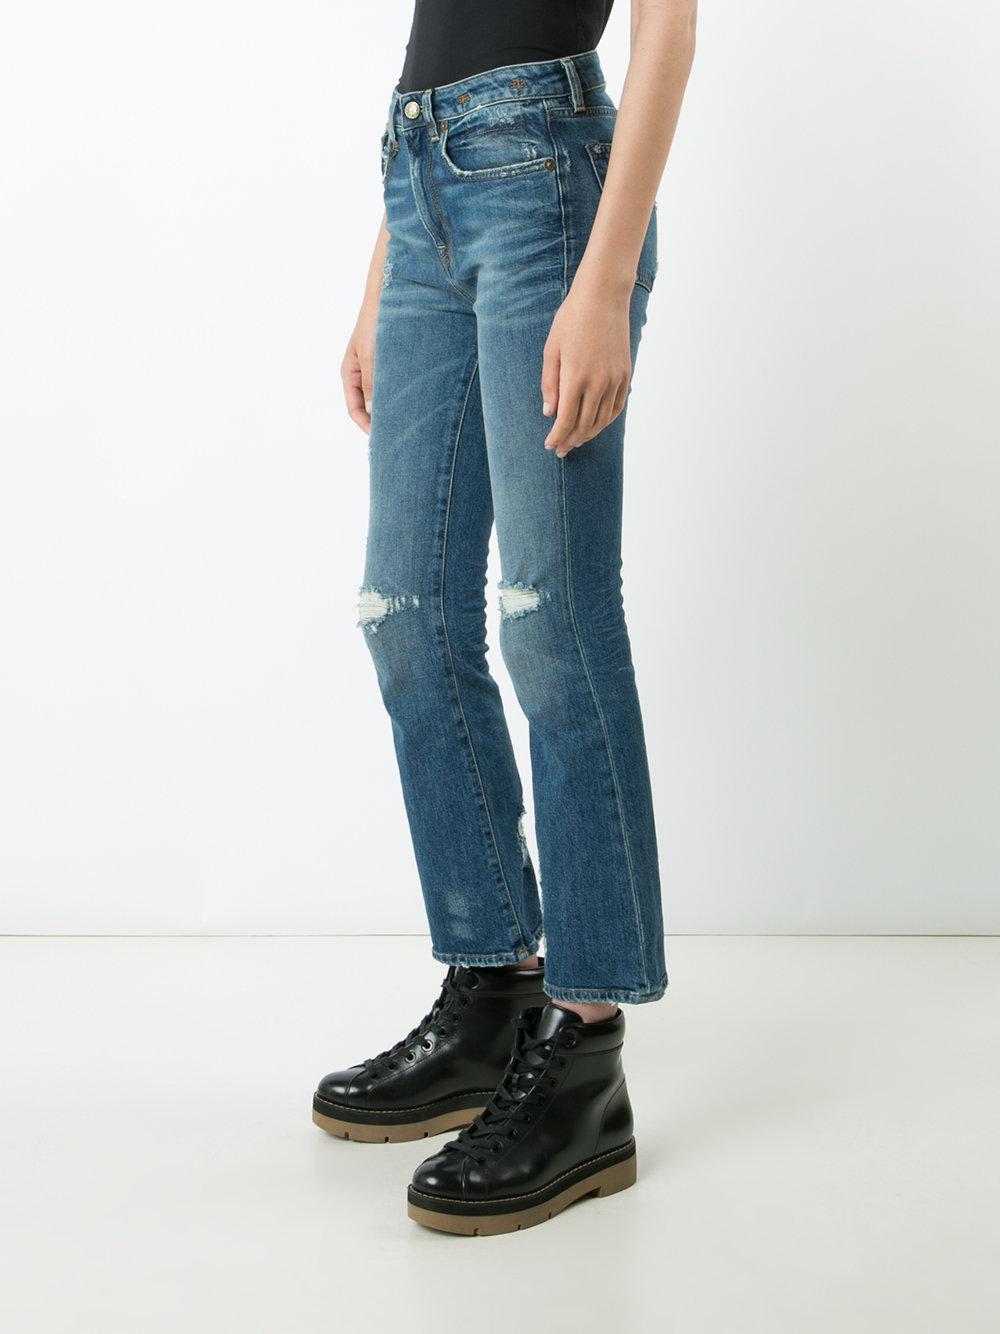 R13 Denim Flared Jeans in Blue